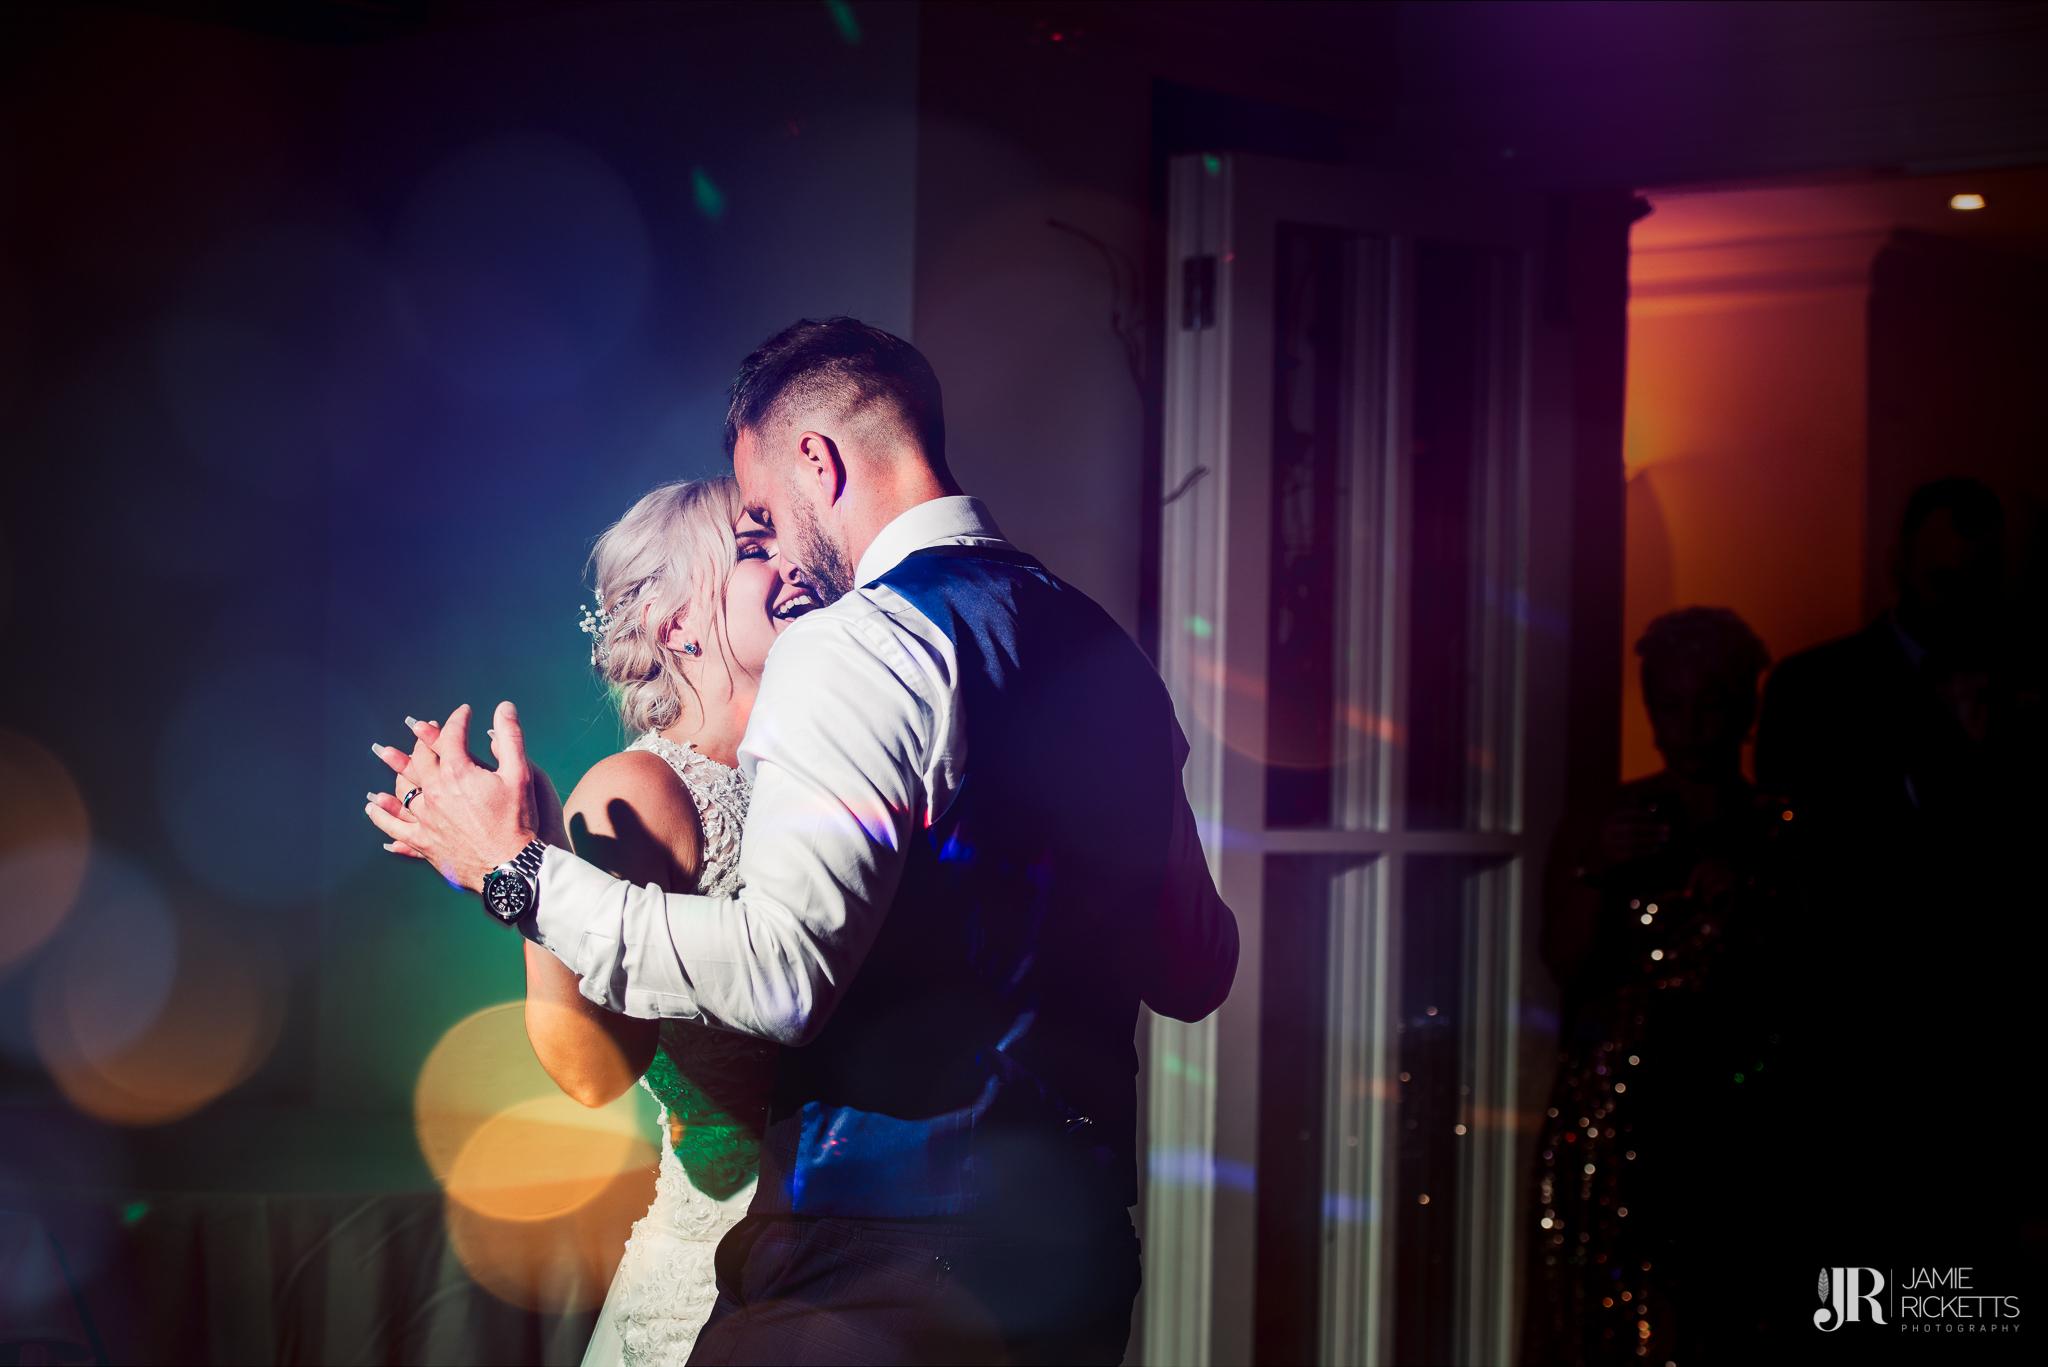 Wedding-Photographer-Shropshire-1.JPG